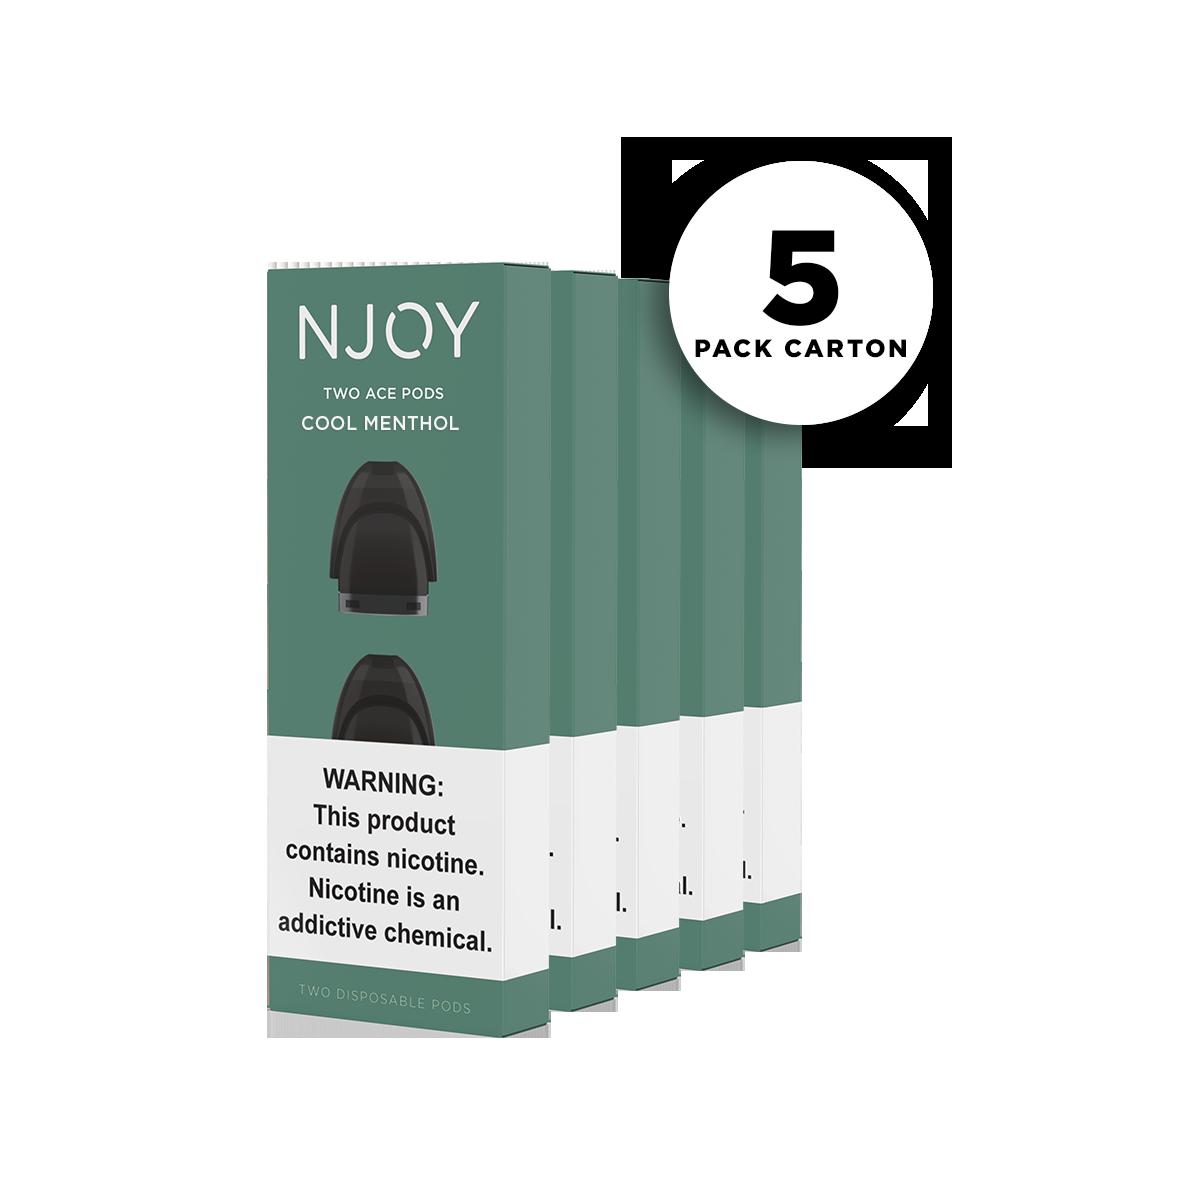 NJOY ACE PODS: Mint 5-Pack Carton